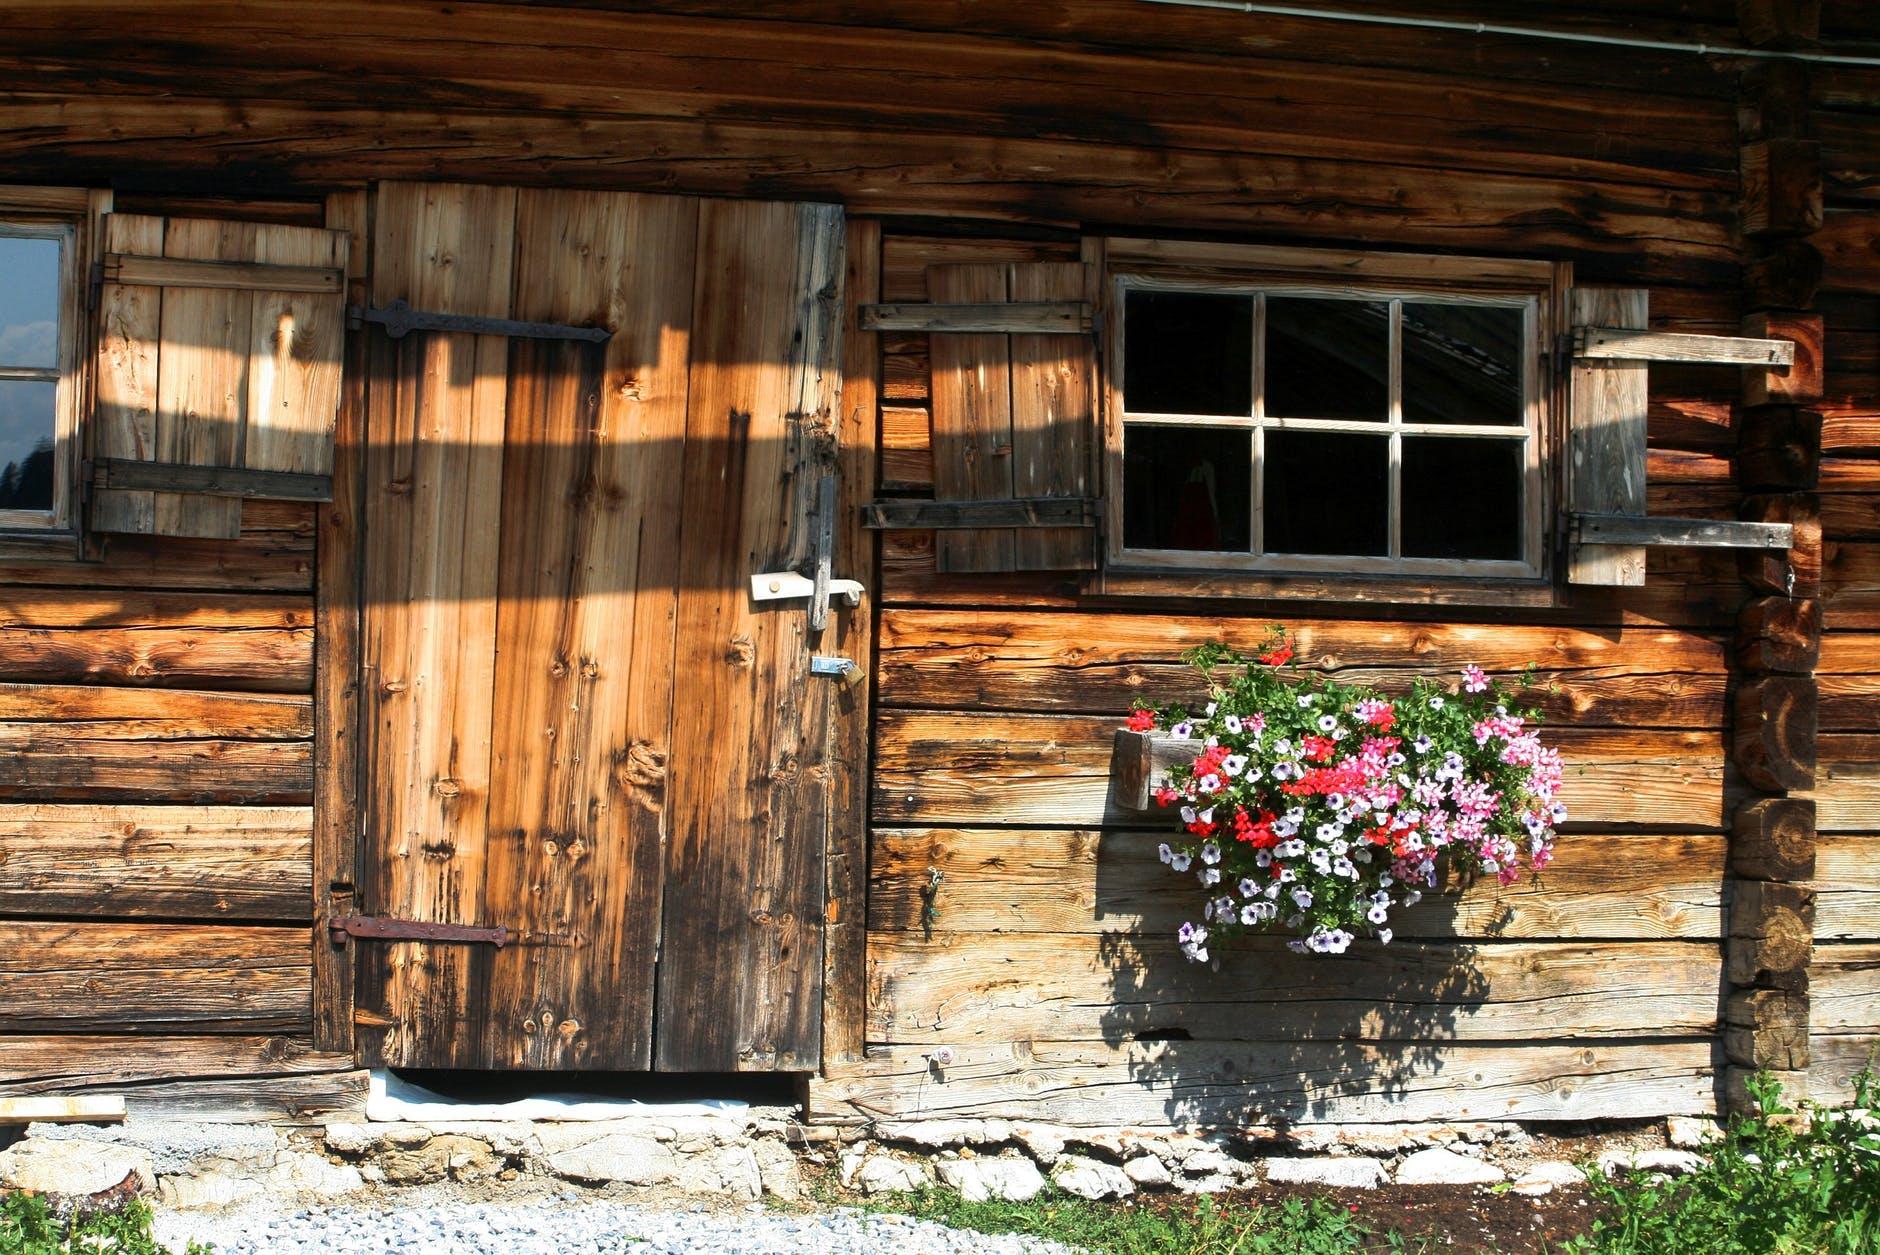 architecture barn bungalow cabin